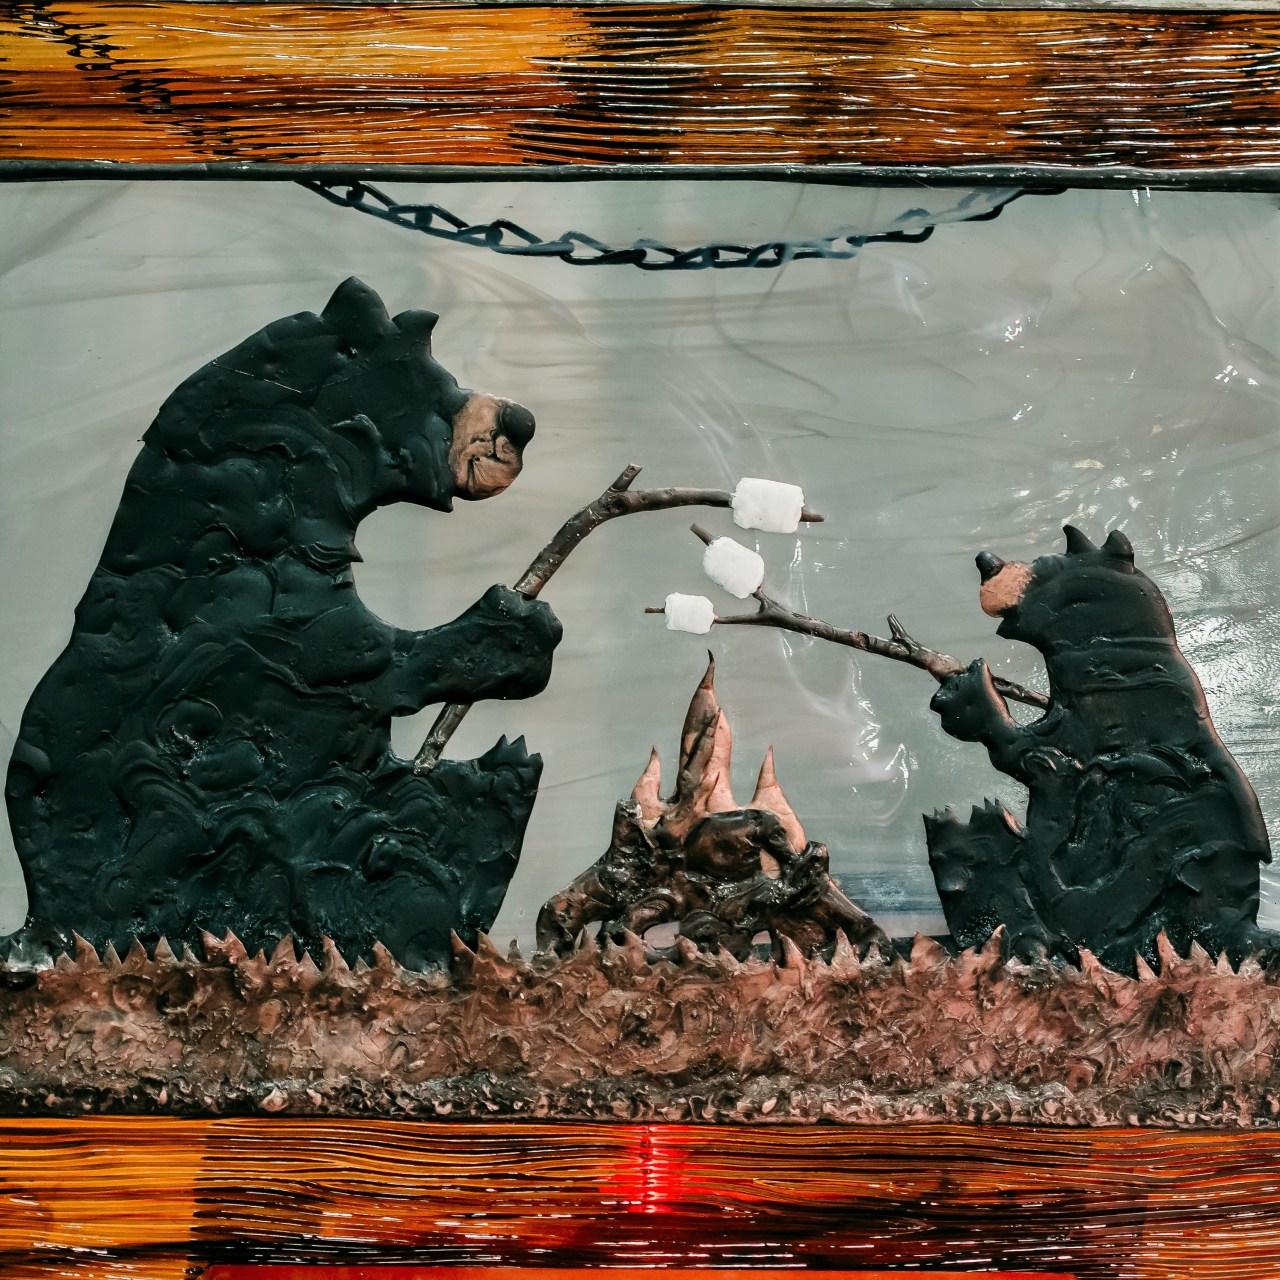 Stained Glass Bears Roast Marshmallows